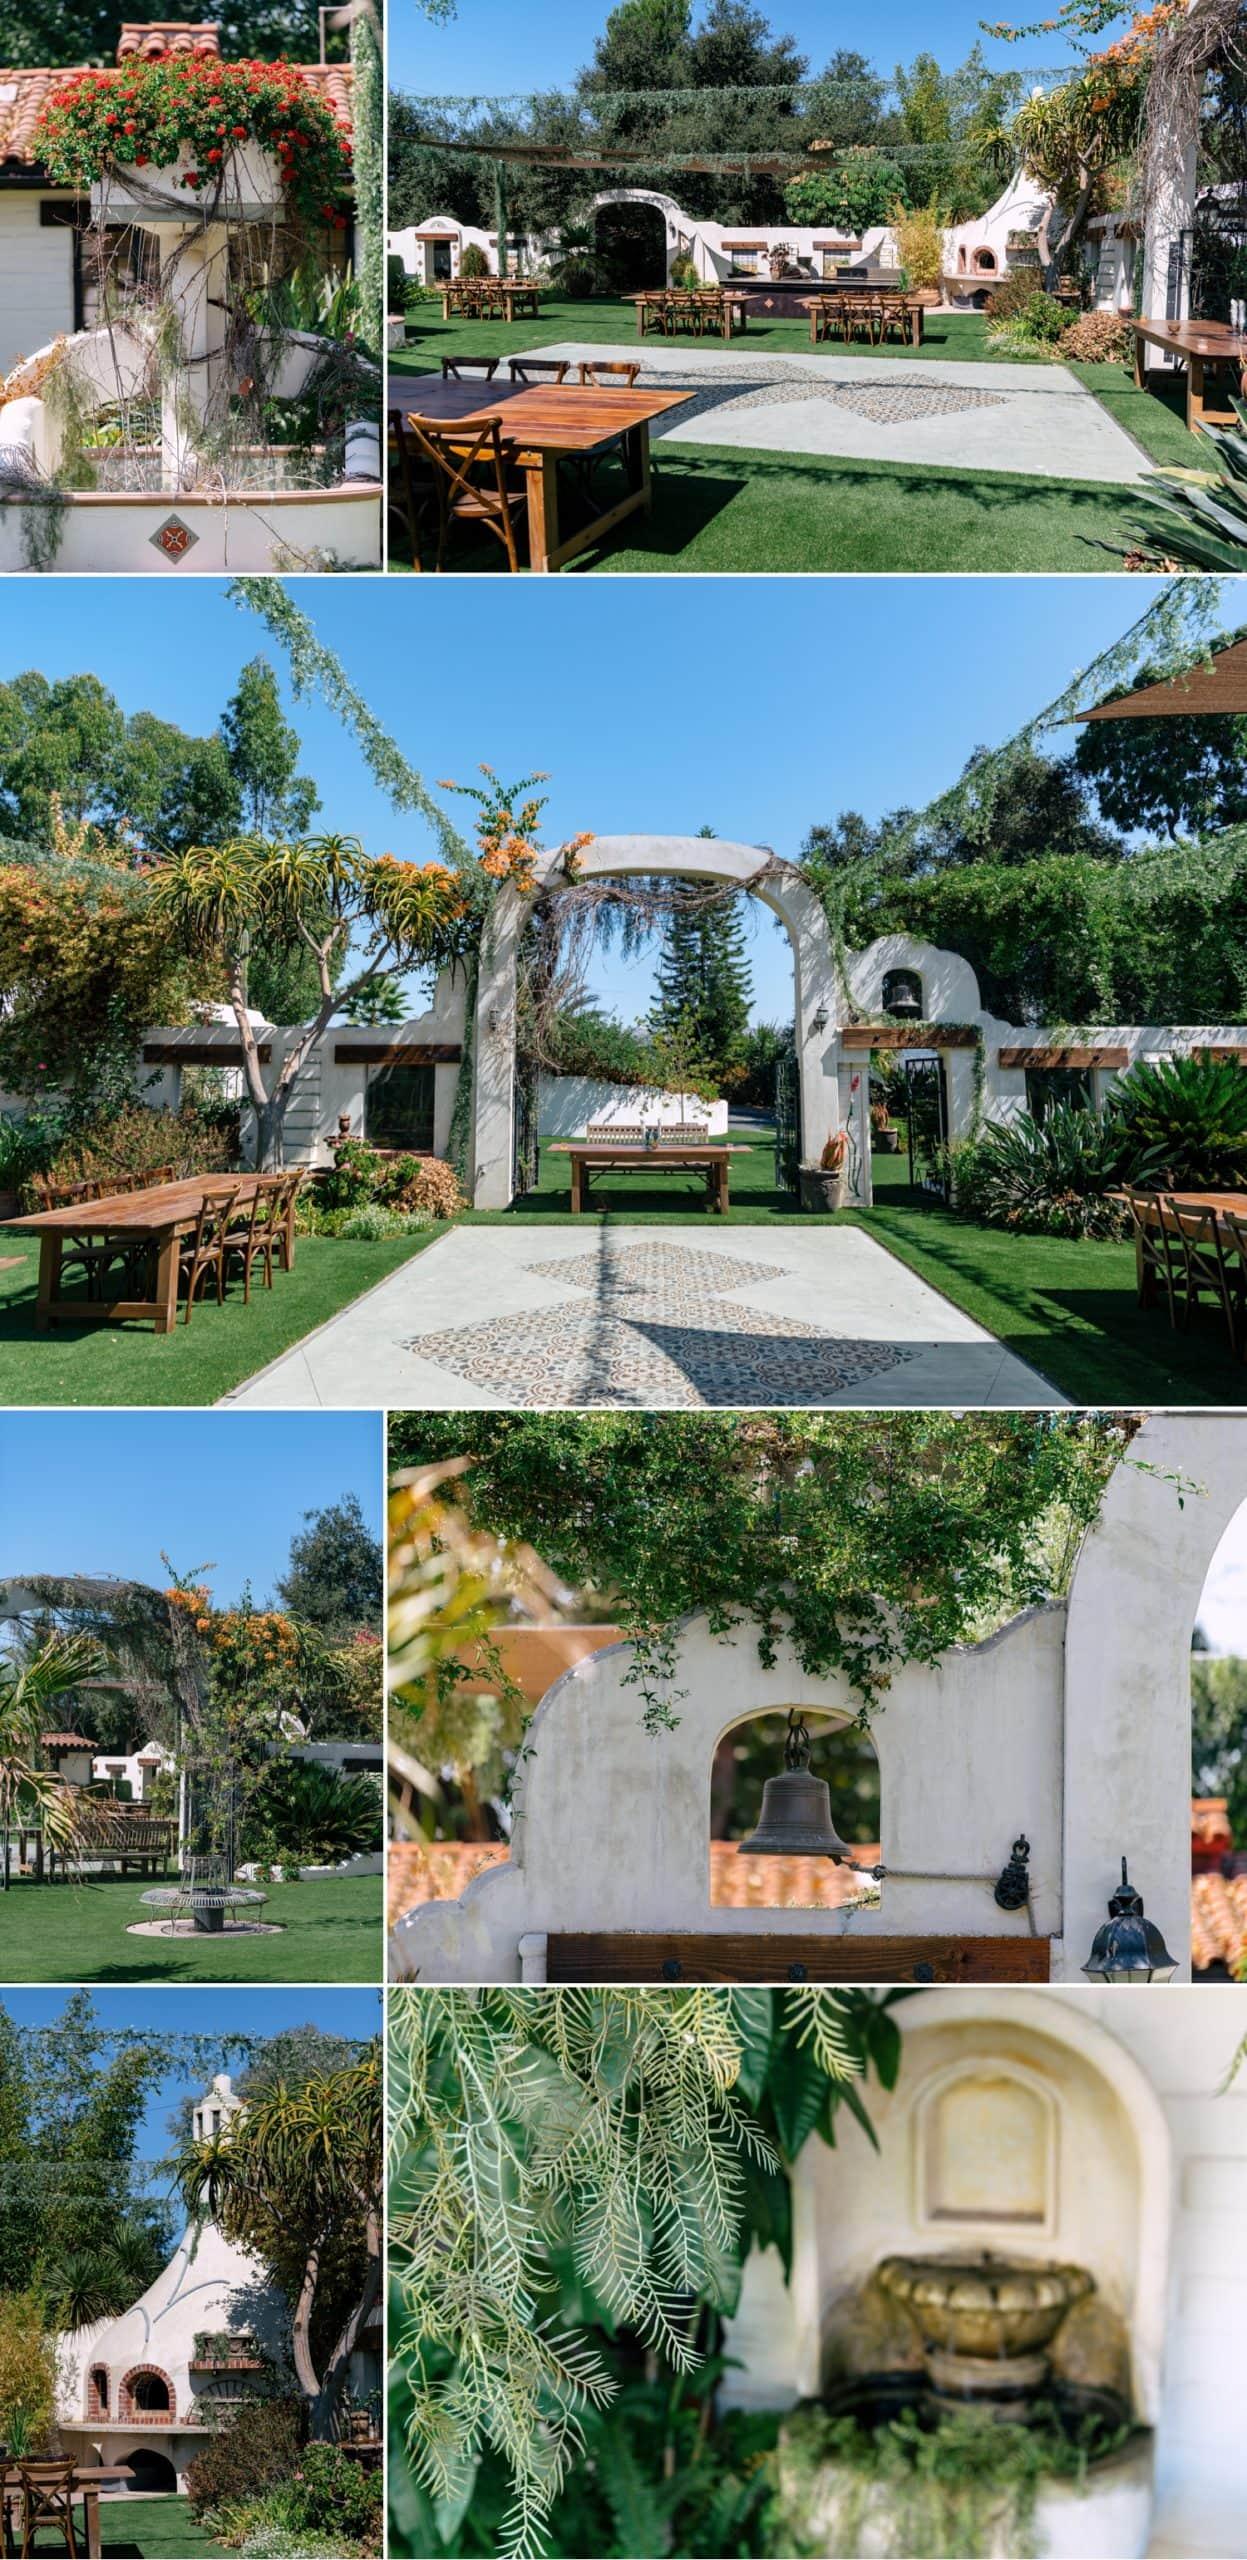 Tivoli wedding venue in Fallbrook, CA.